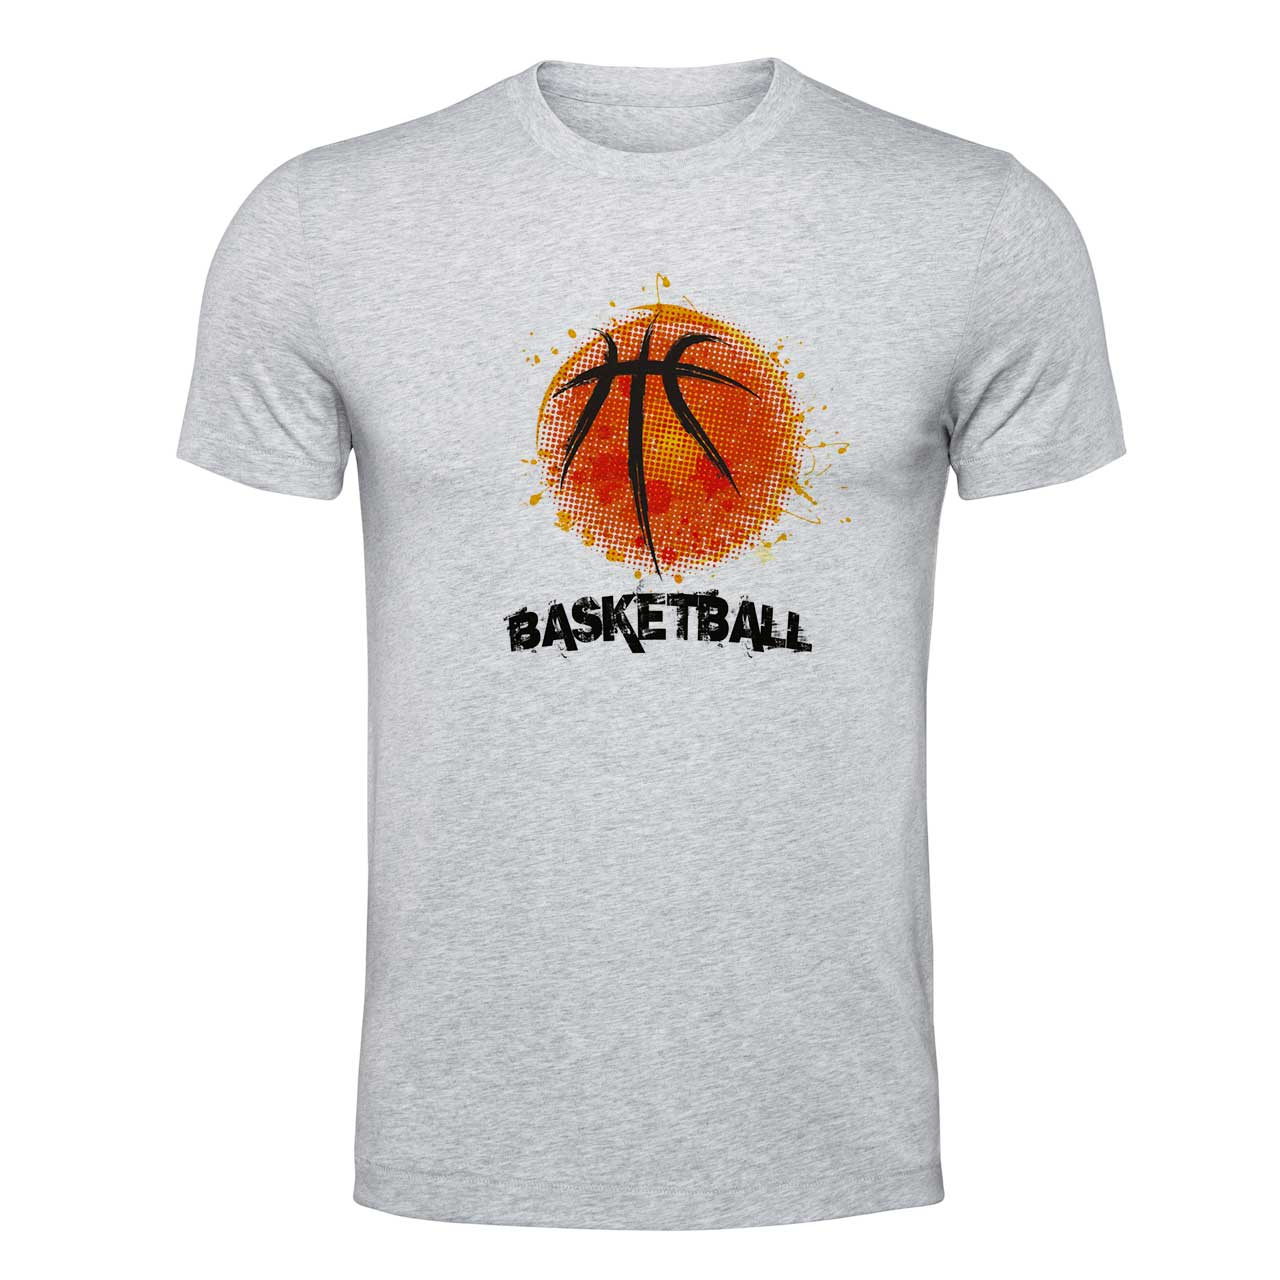 تیشرت الینور طرح بسکتبال کد EML304